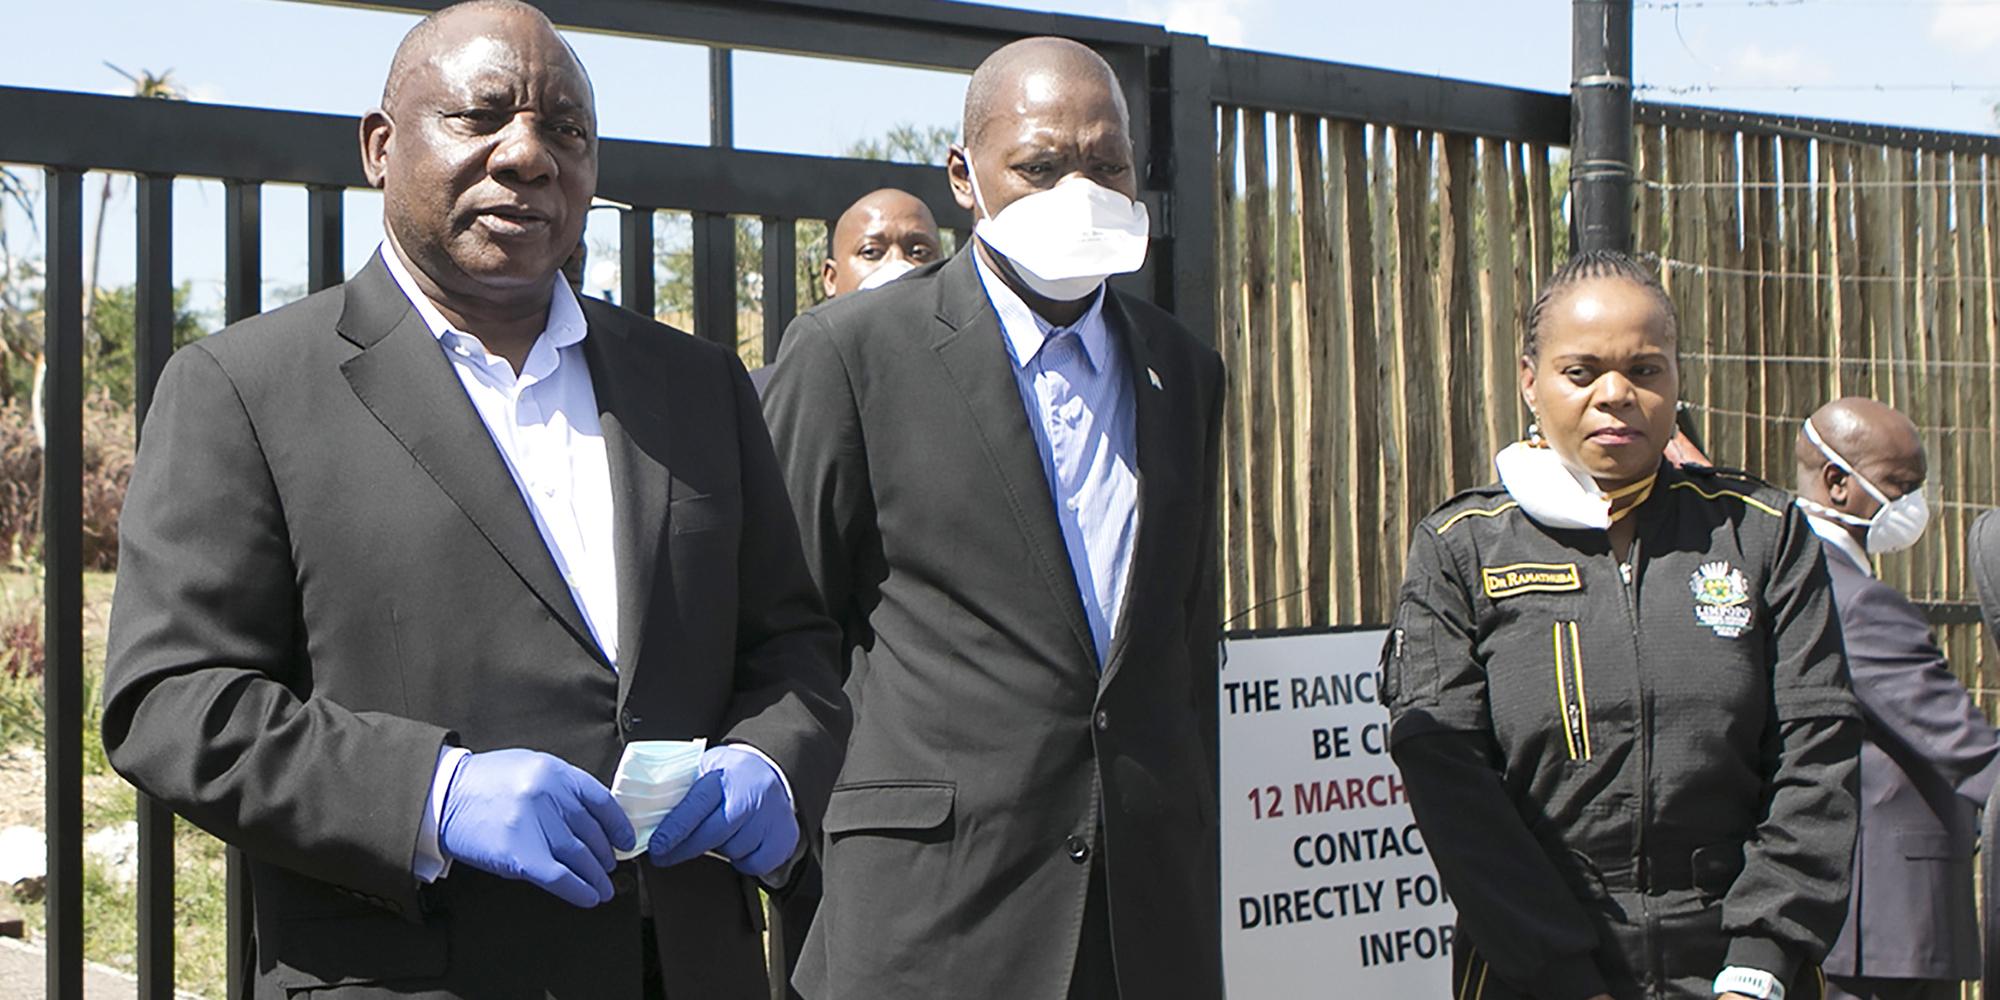 Limpopo health MEC locks up doctors in hospital quarantine - Daily Maverick